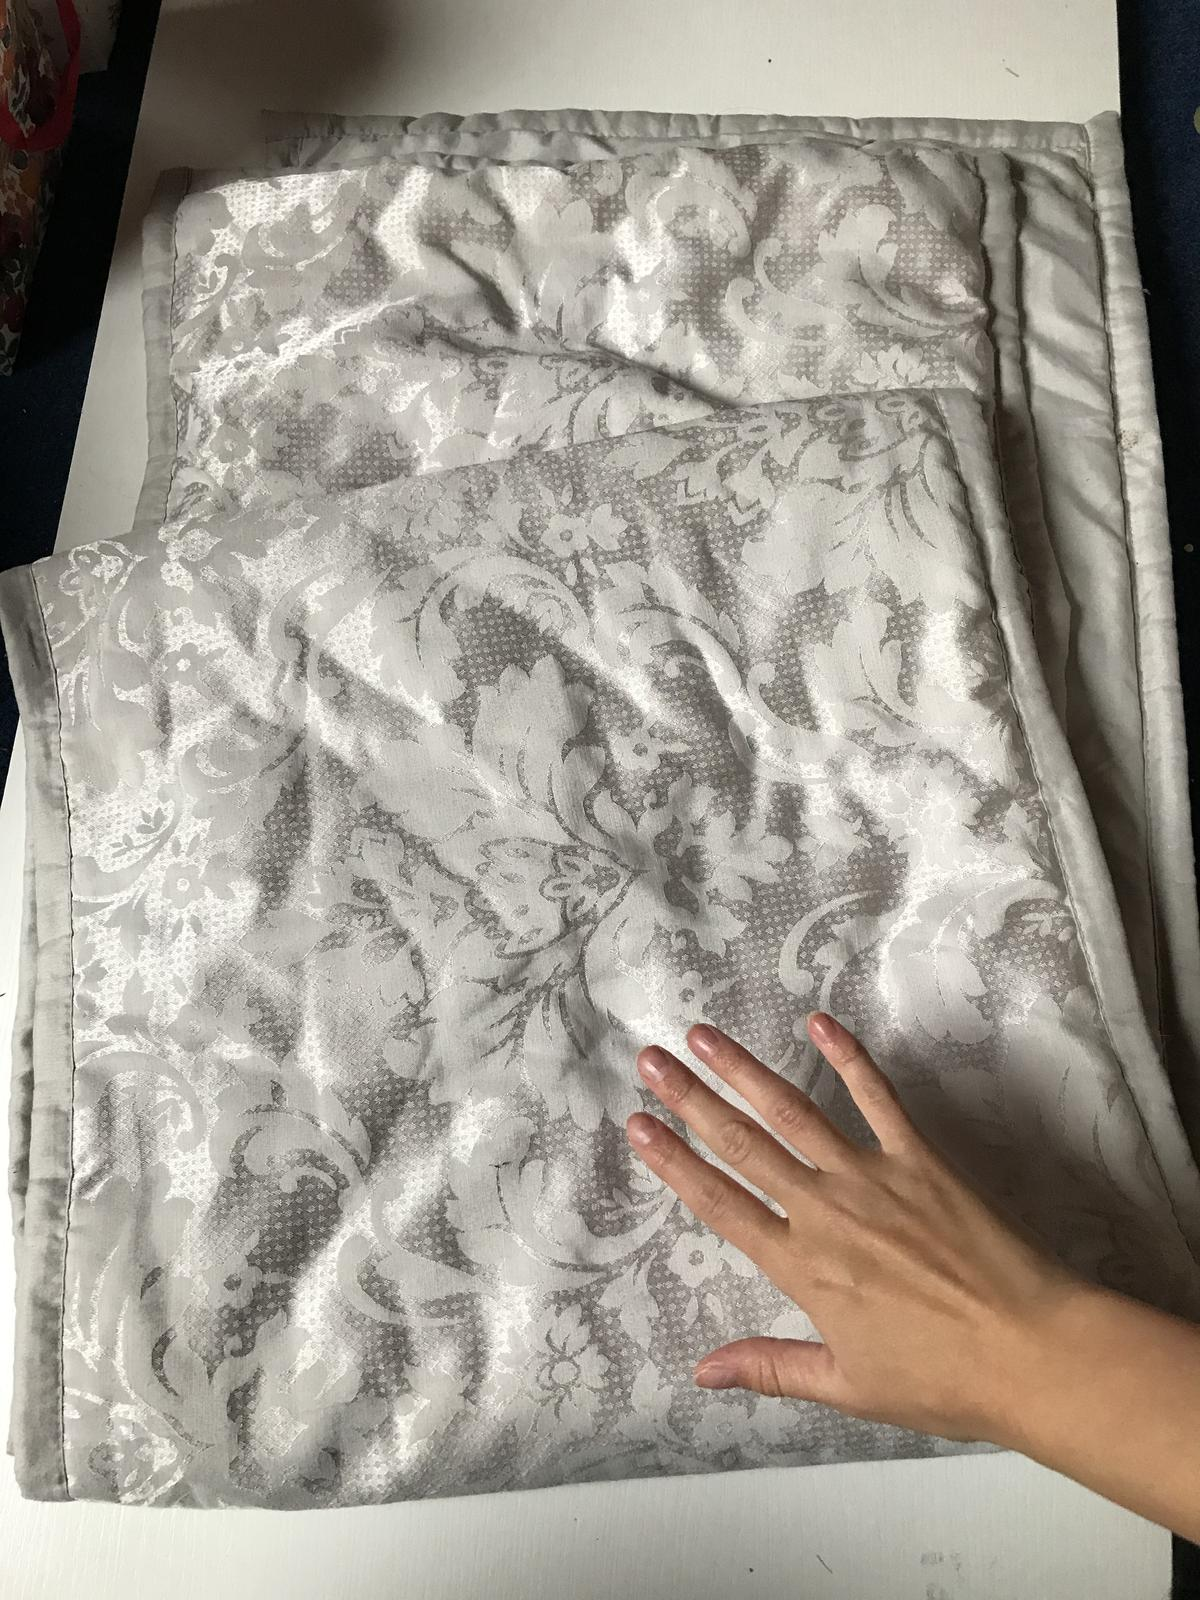 stříbrnošedý potah/deka - Obrázek č. 1